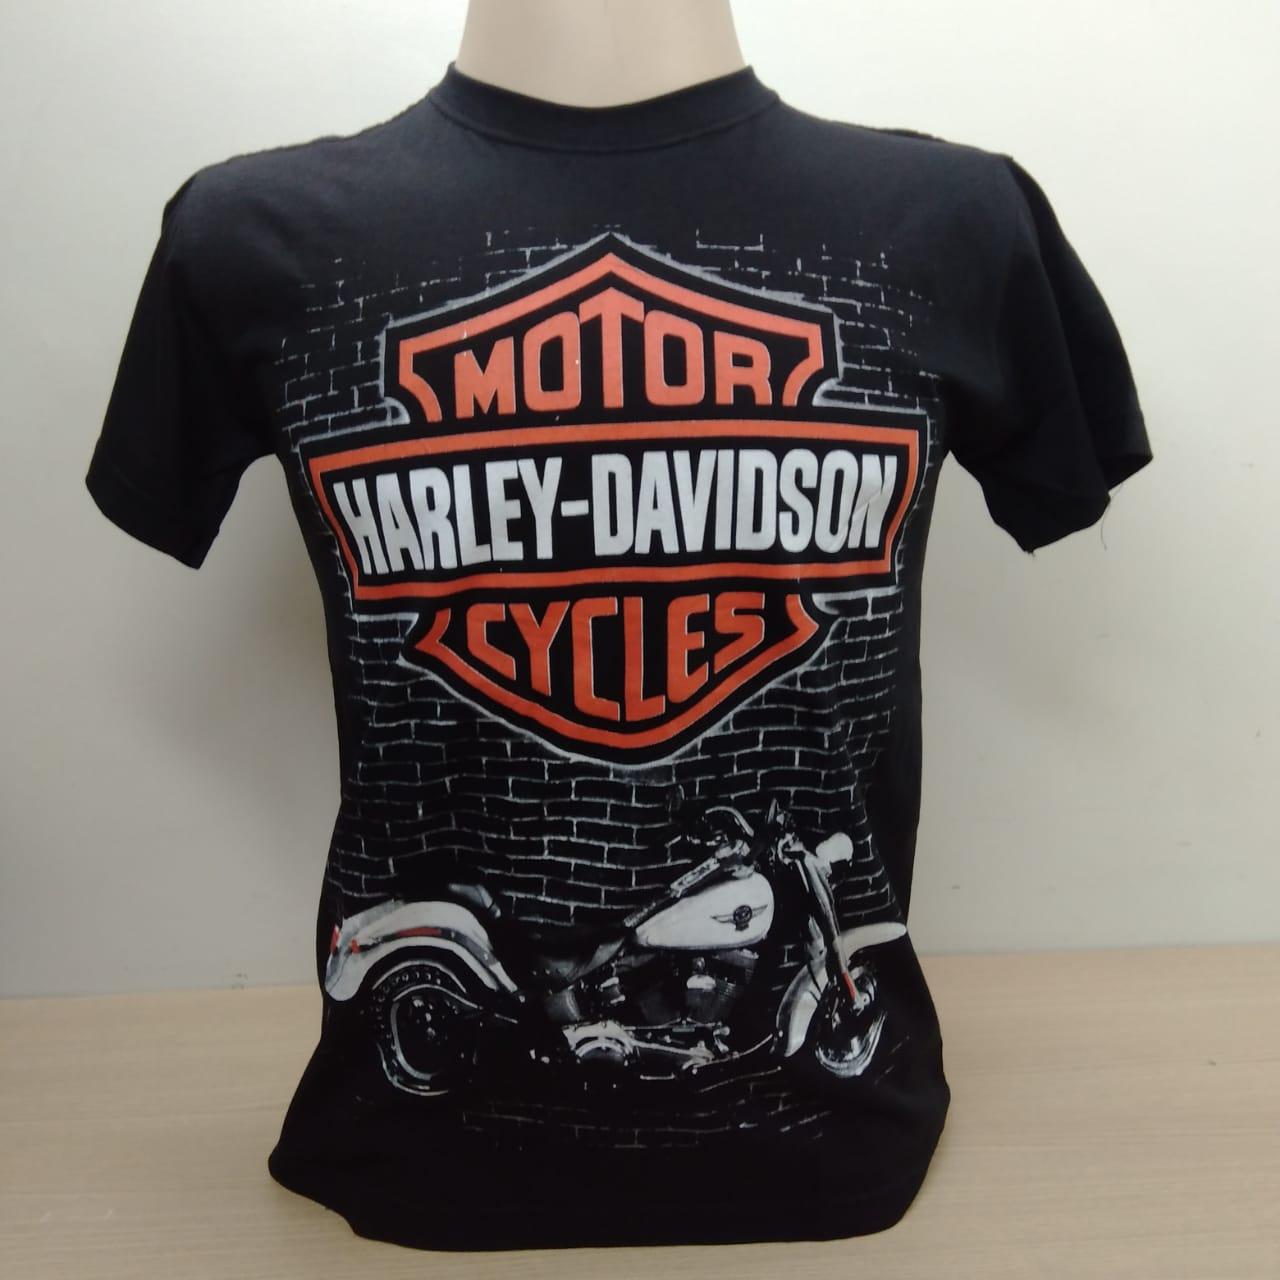 Camiseta Masculina - Motivo Harley-Davidson The Wall - Preta - 026/51602